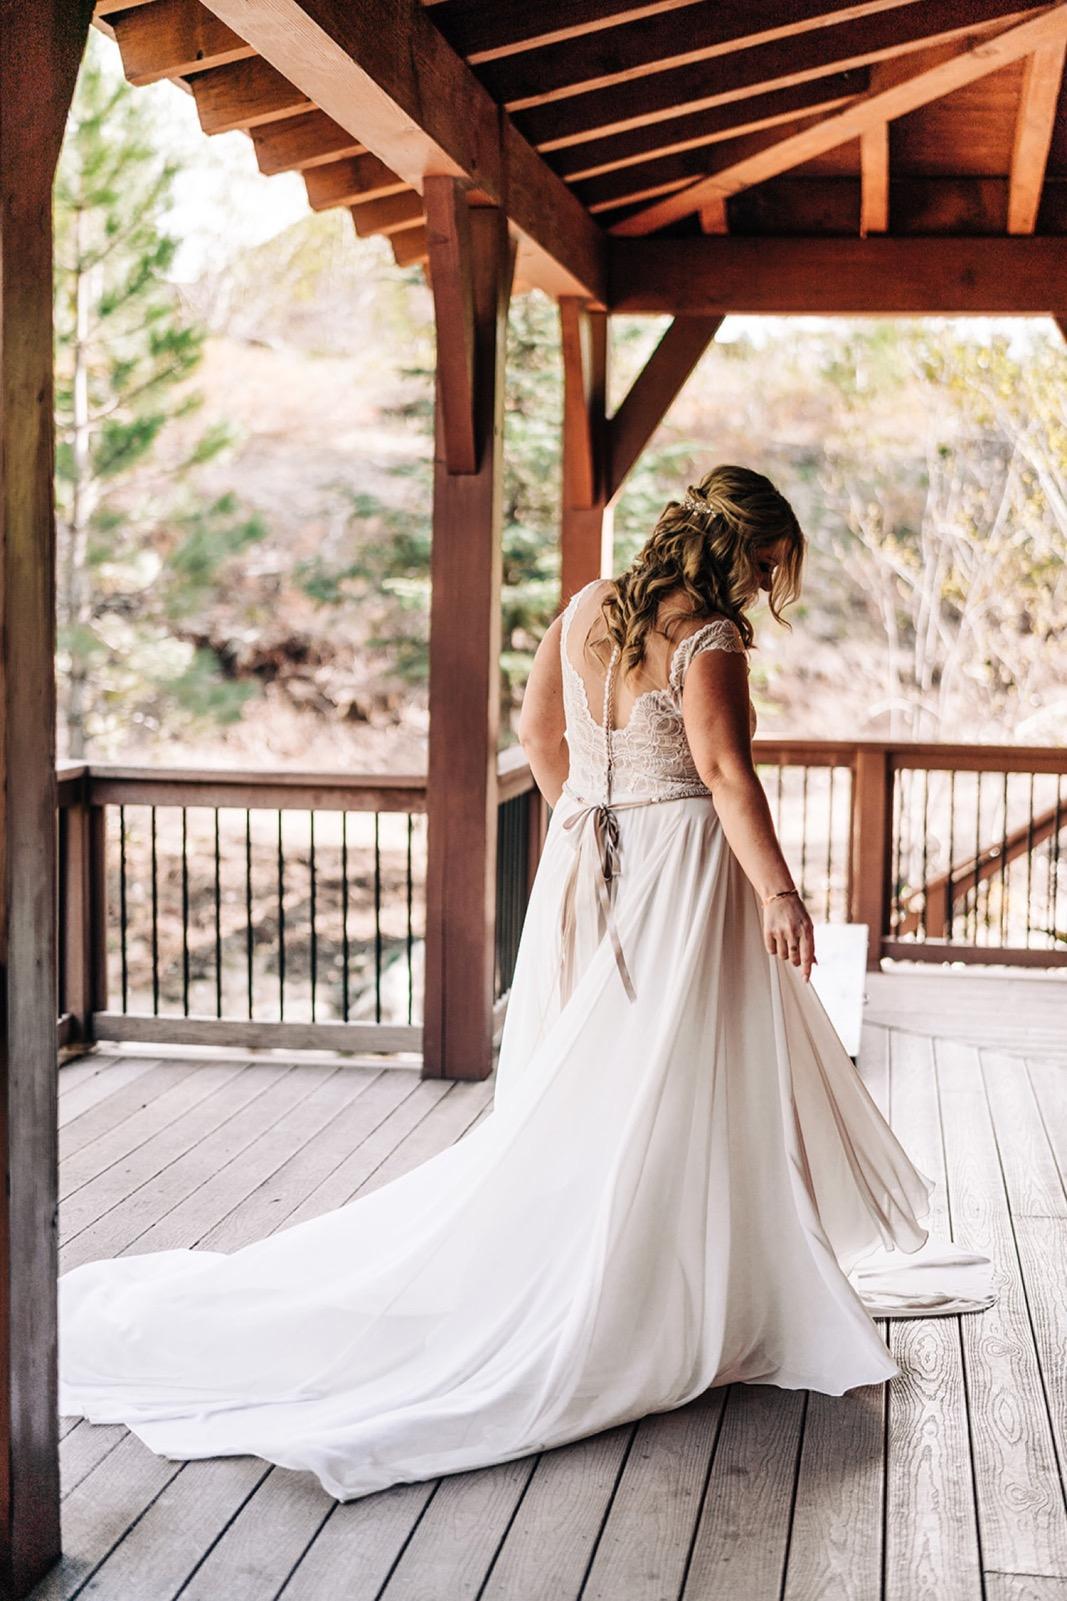 126_falissa_heather_wedding-391.jpg